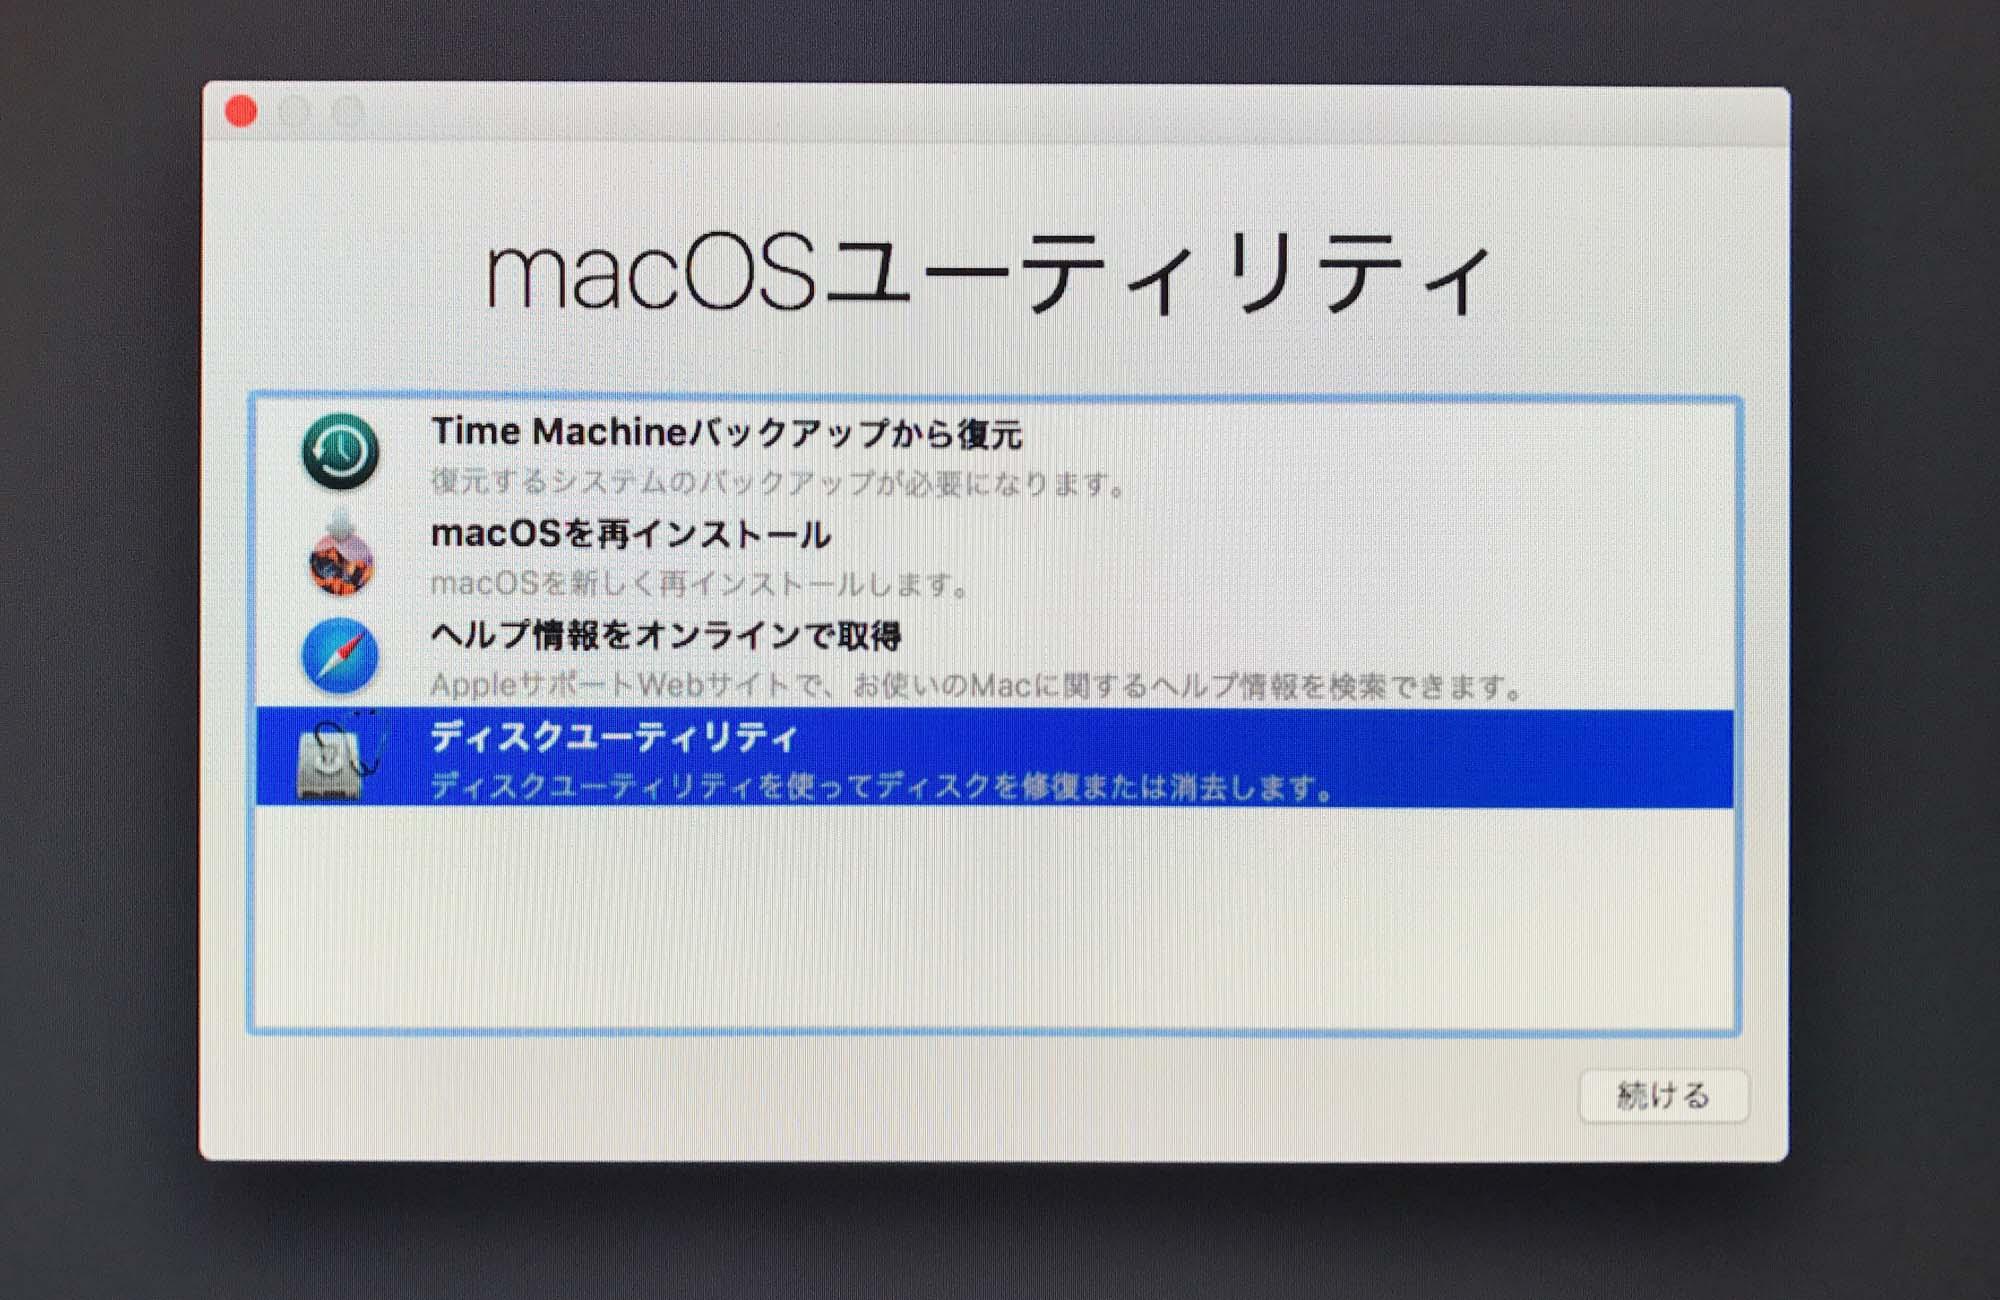 macos_utility